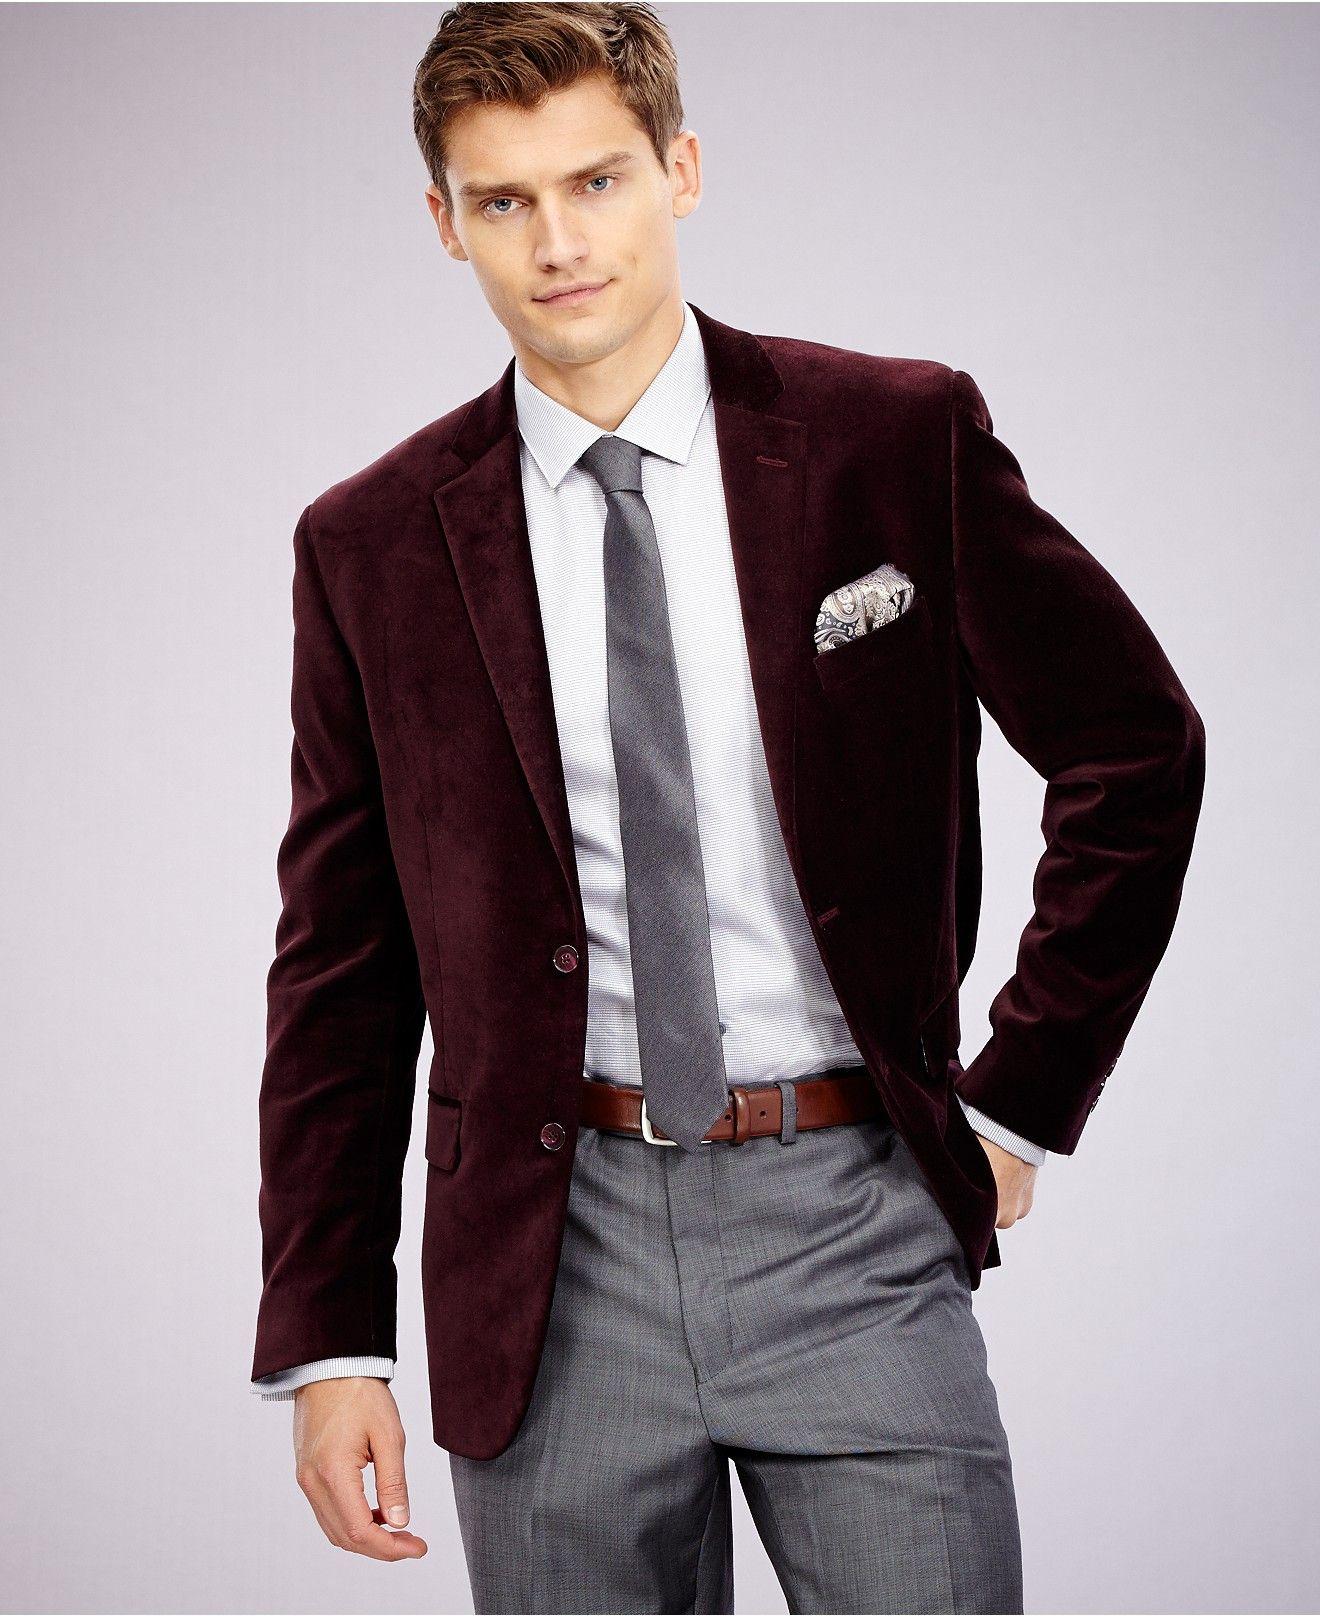 Alfani RED Slim-Fit Velvet Sport Coat - Blazers & Sport Coats ...